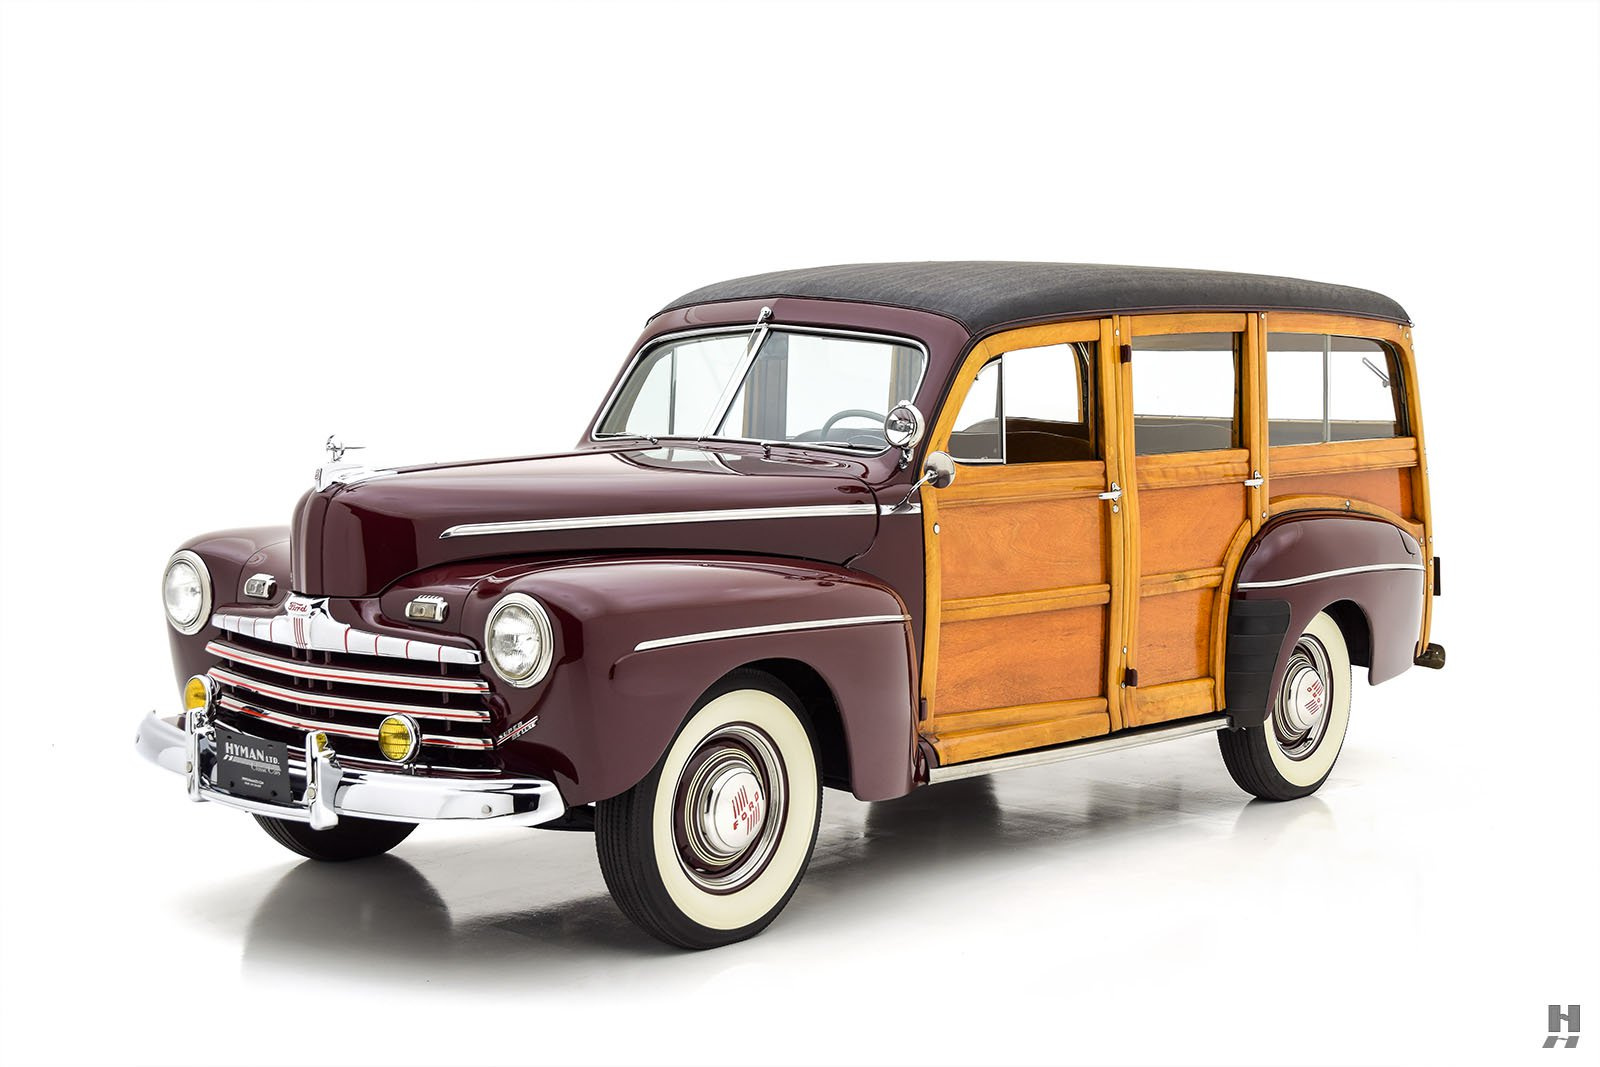 1946 Ford Super Deluxe Vintage Car For Sale